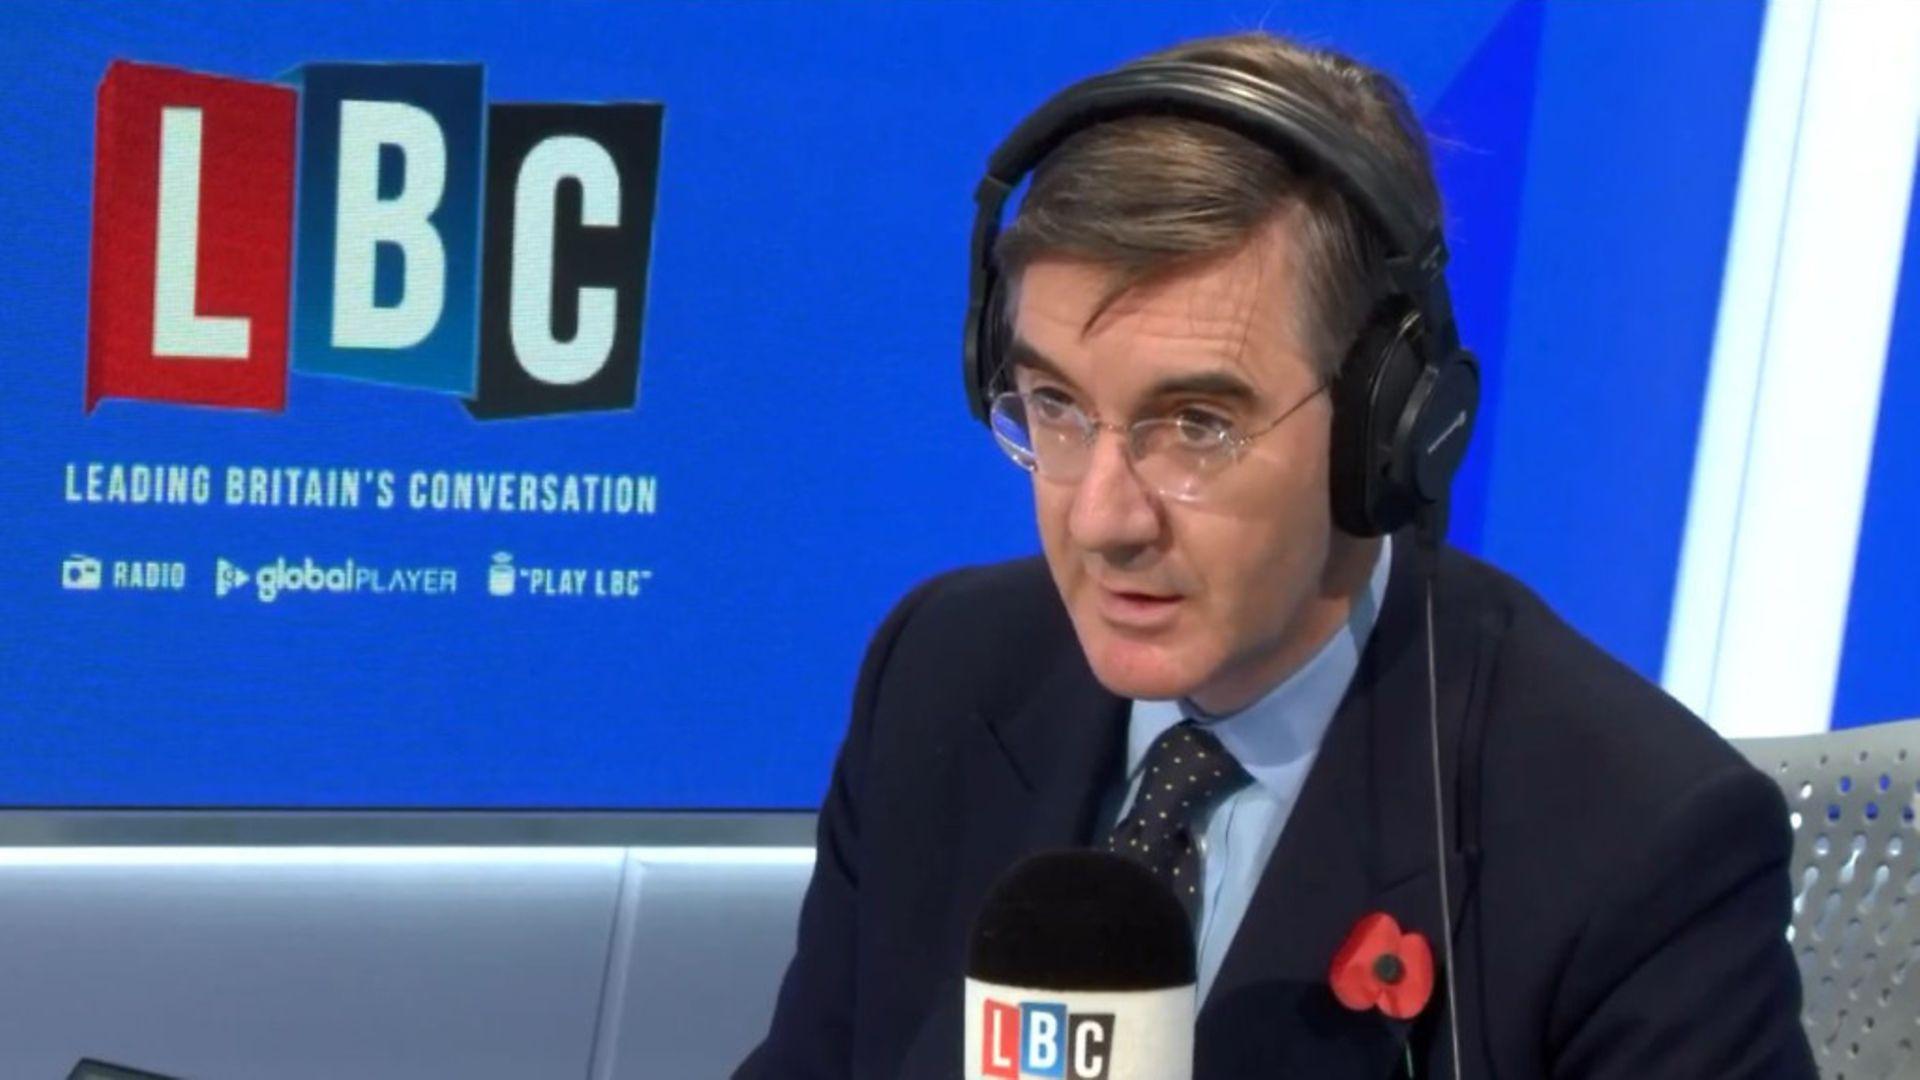 Jacob Rees-Mogg appears on LBC Radio - Credit: Global